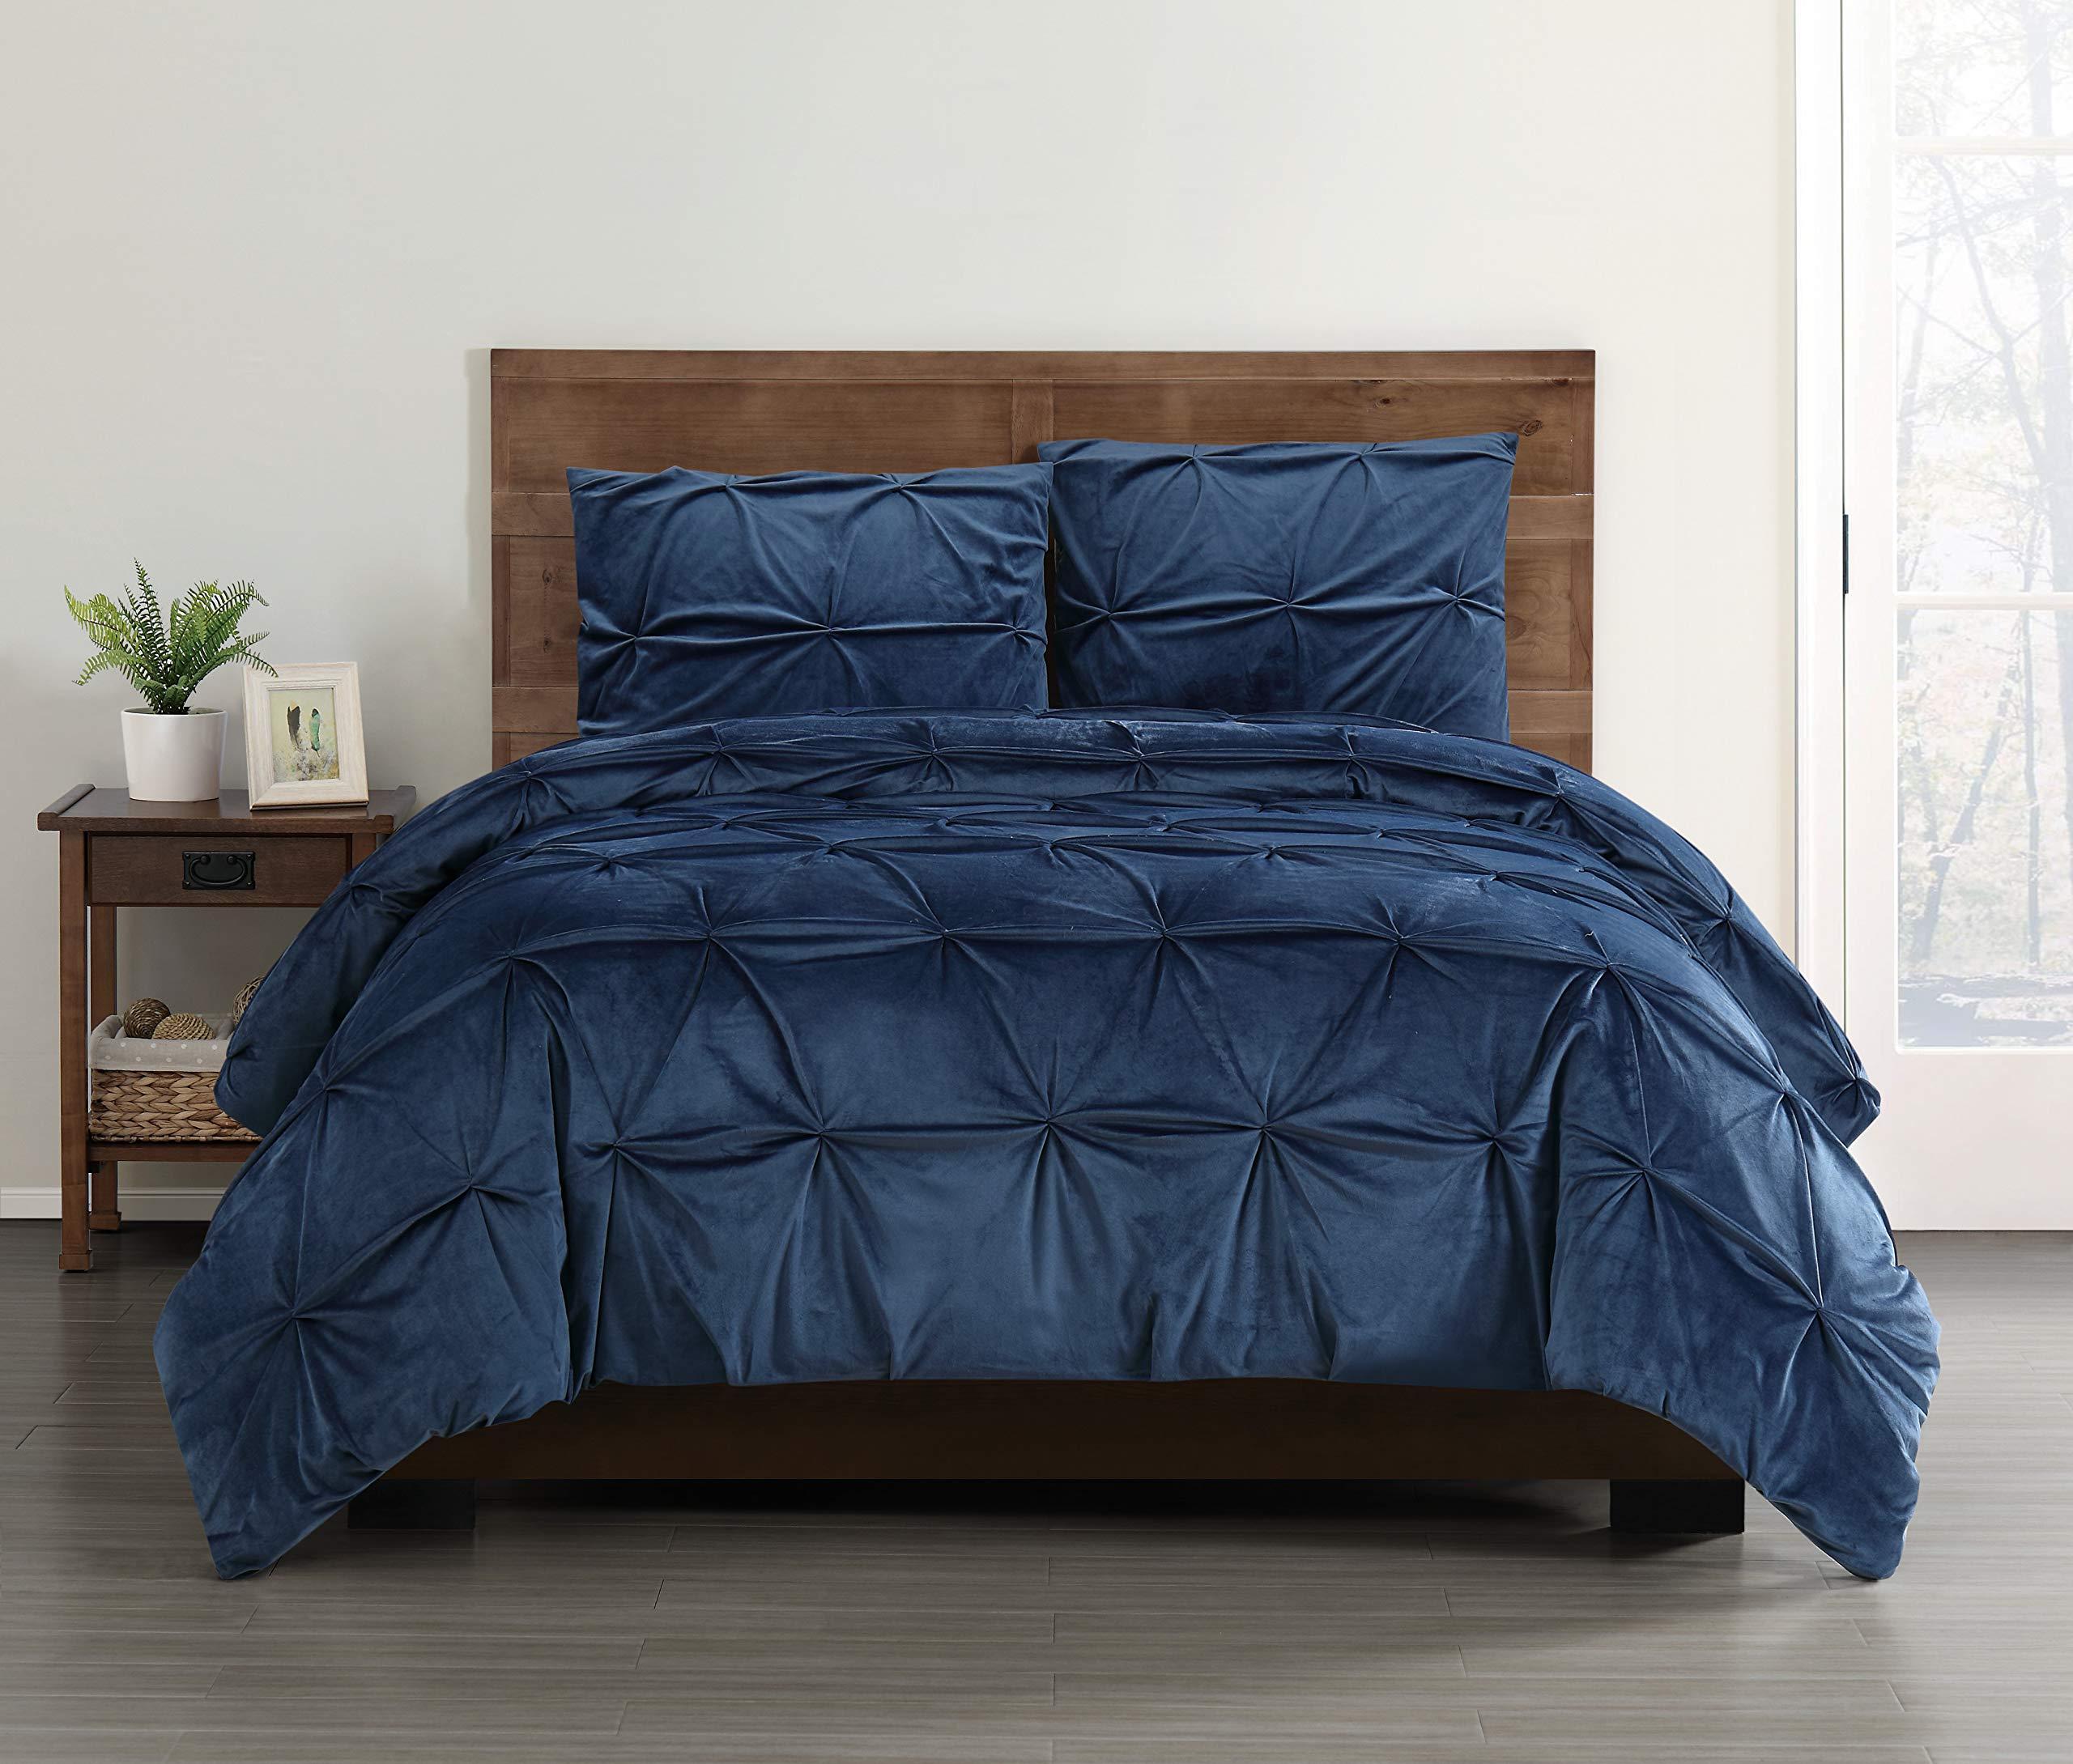 Truly Soft Pleated Velvet King 3 Piece Duvet Cover Set in Navy Blue